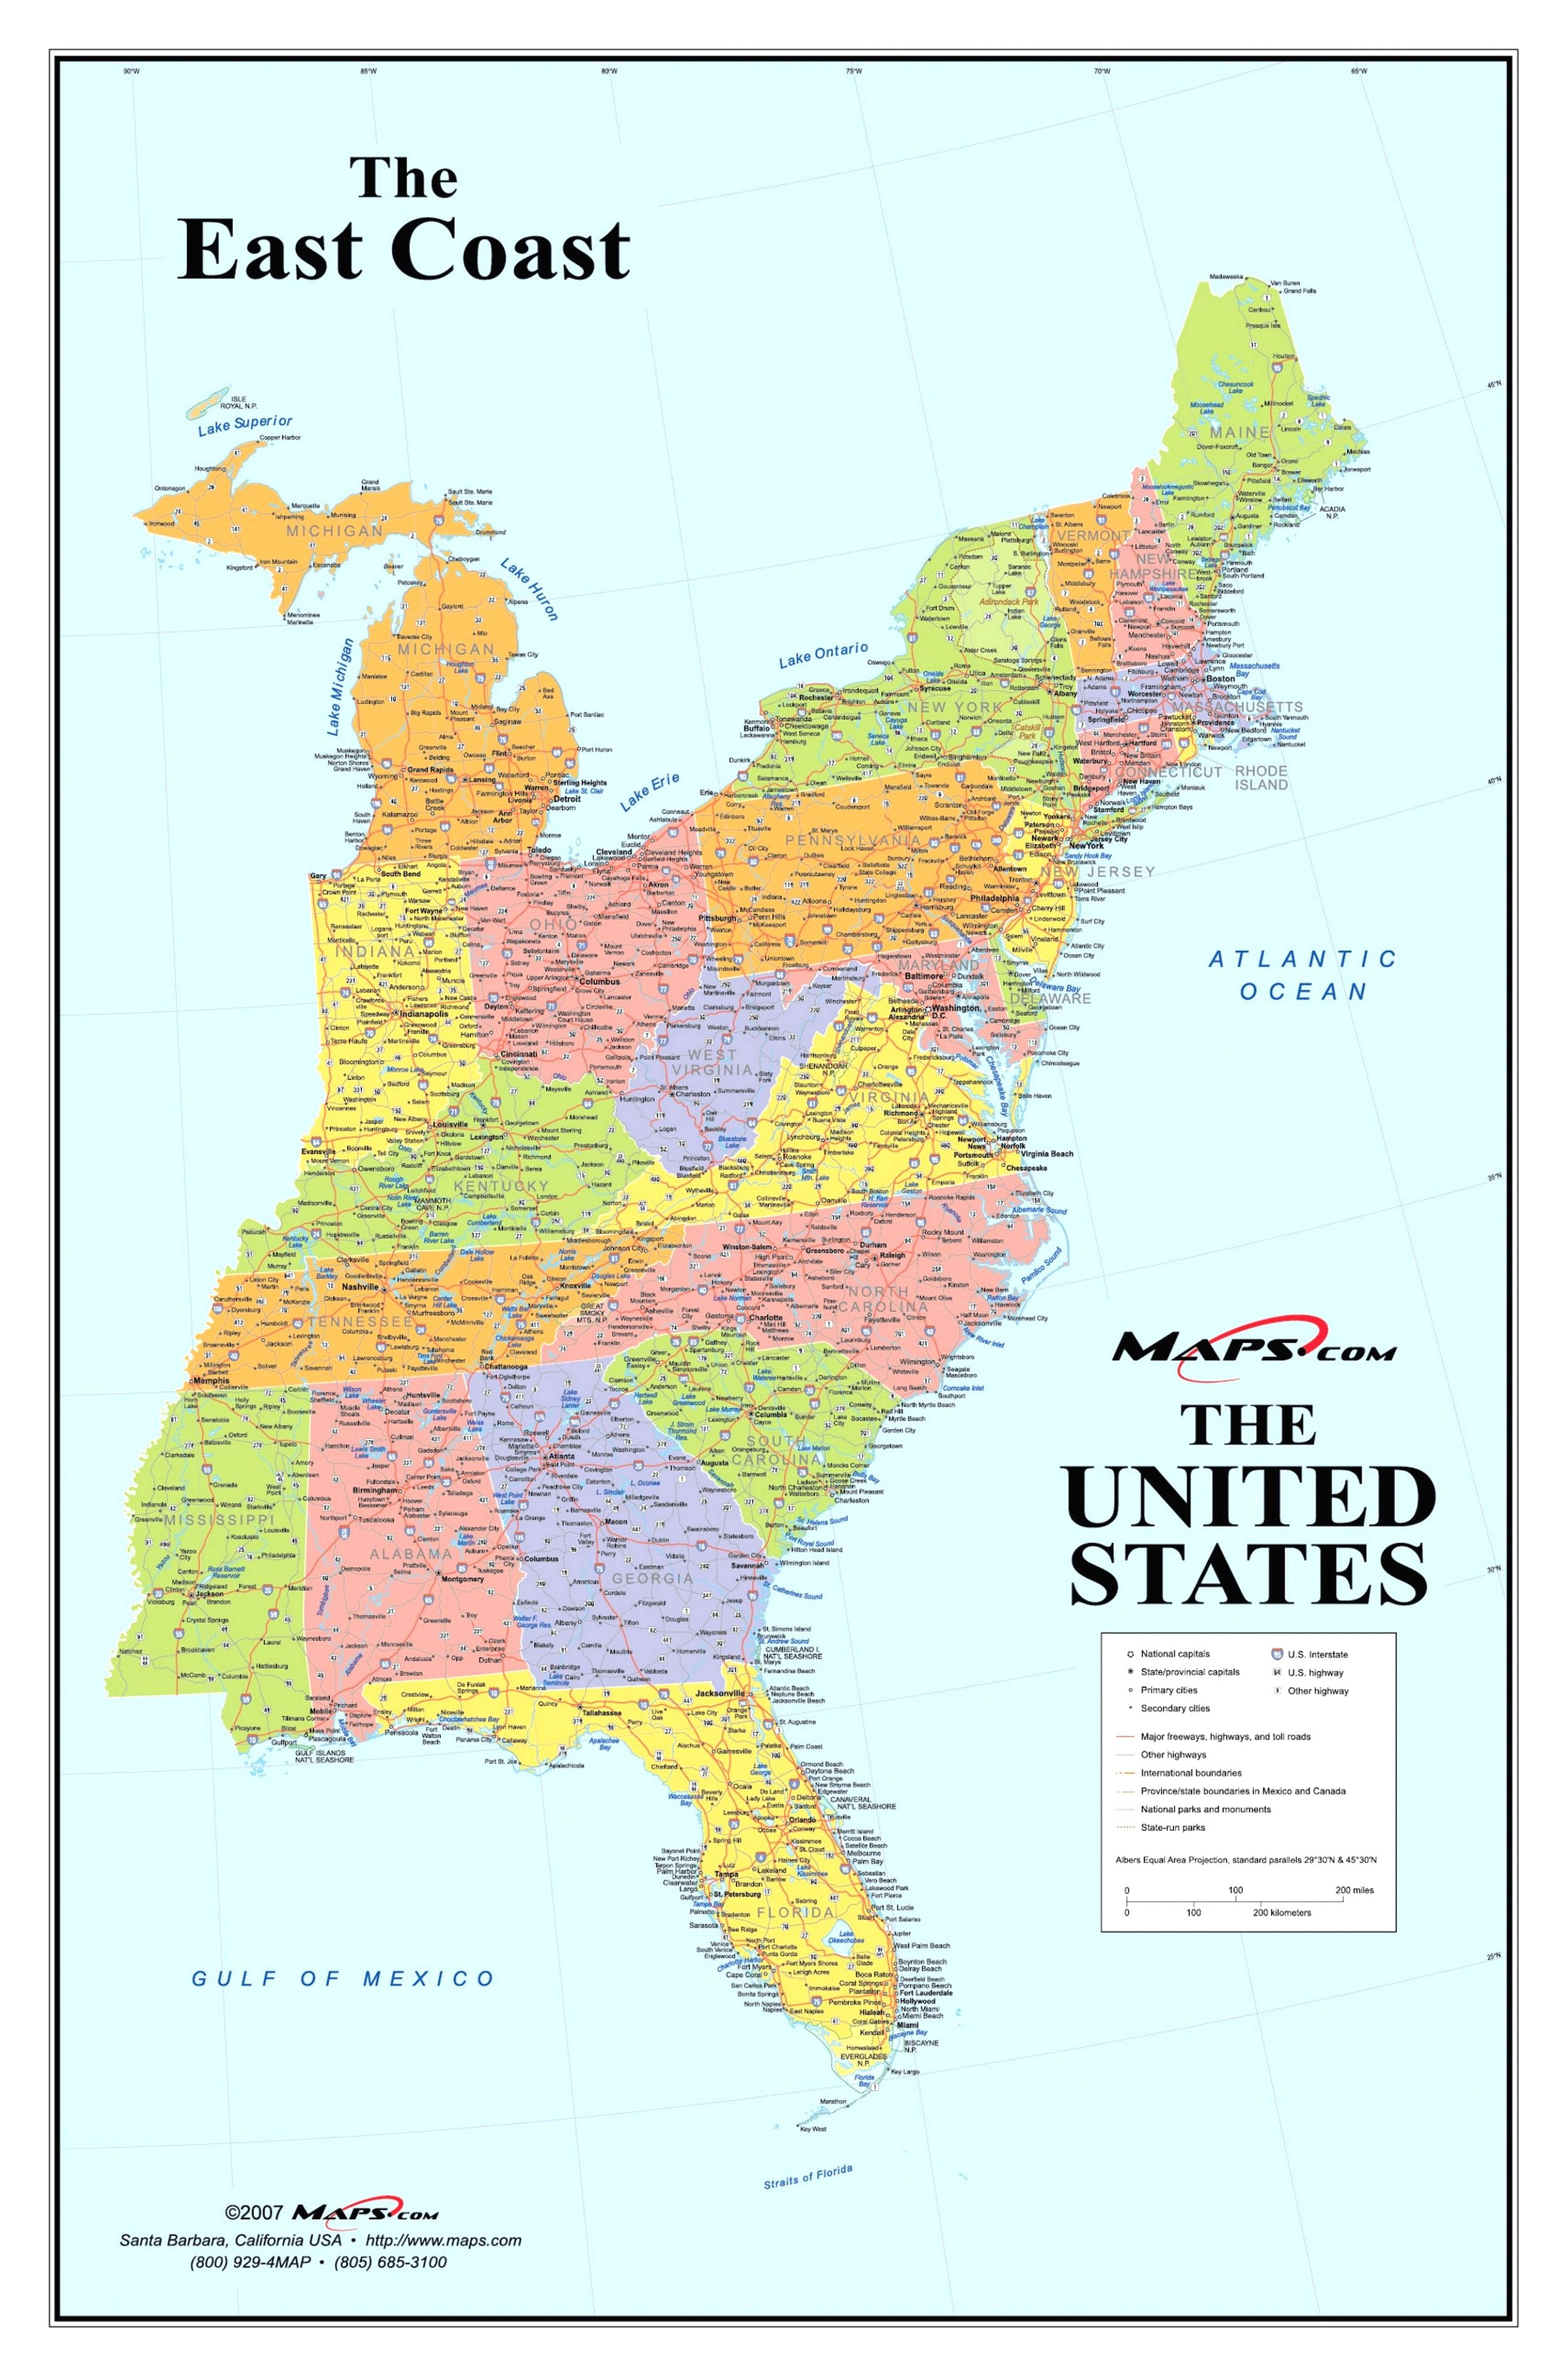 East Coast Map Of United States